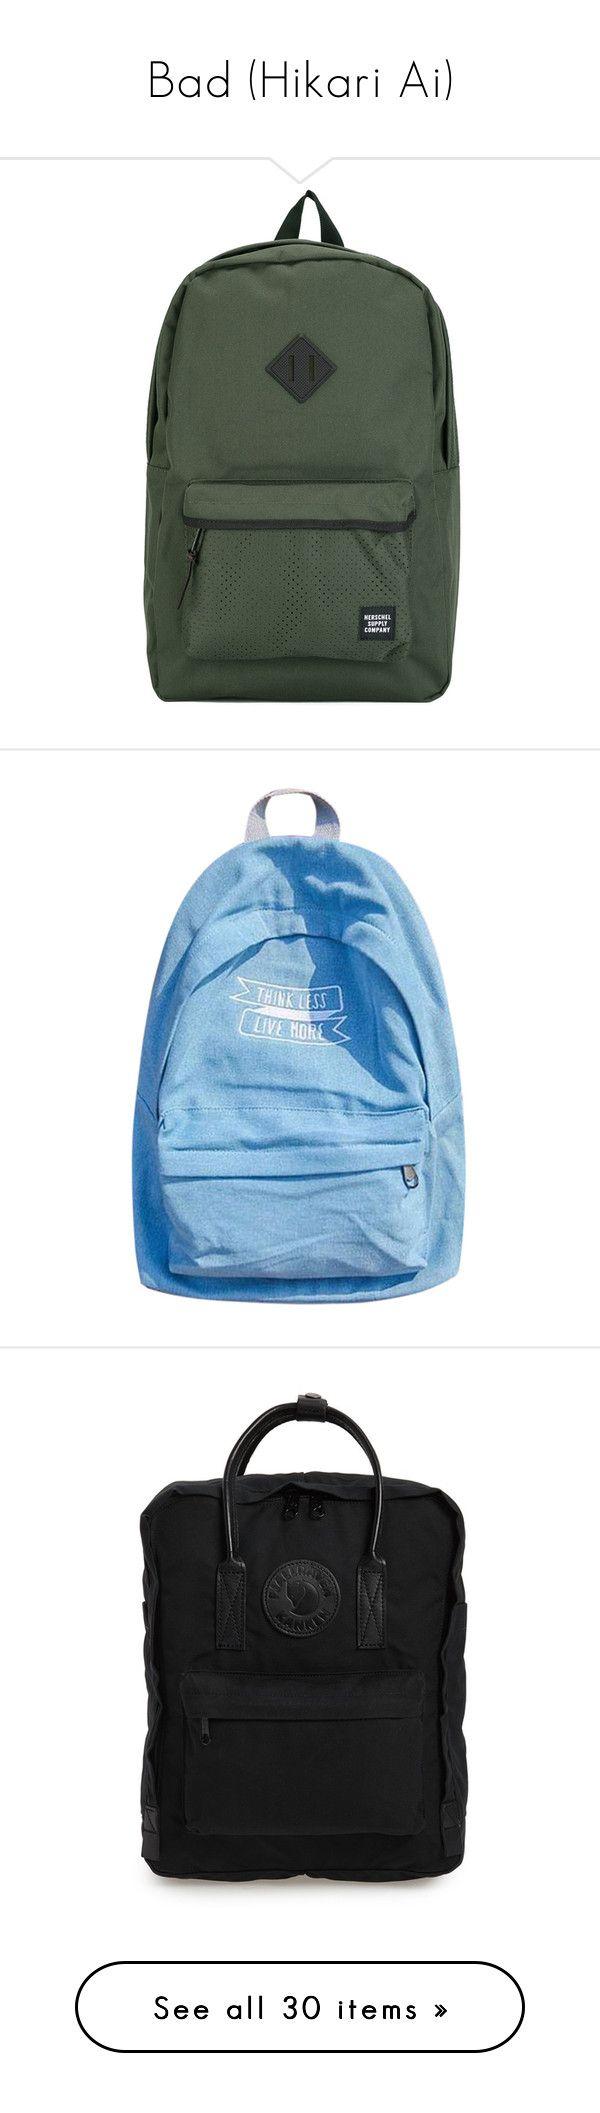 """Bad (Hikari Ai)"" by hikari-ai on Polyvore featuring bags, backpacks, backpack, green, knapsack bag, green backpack, backpack bags, day pack backpack, green bag и daypack bag"